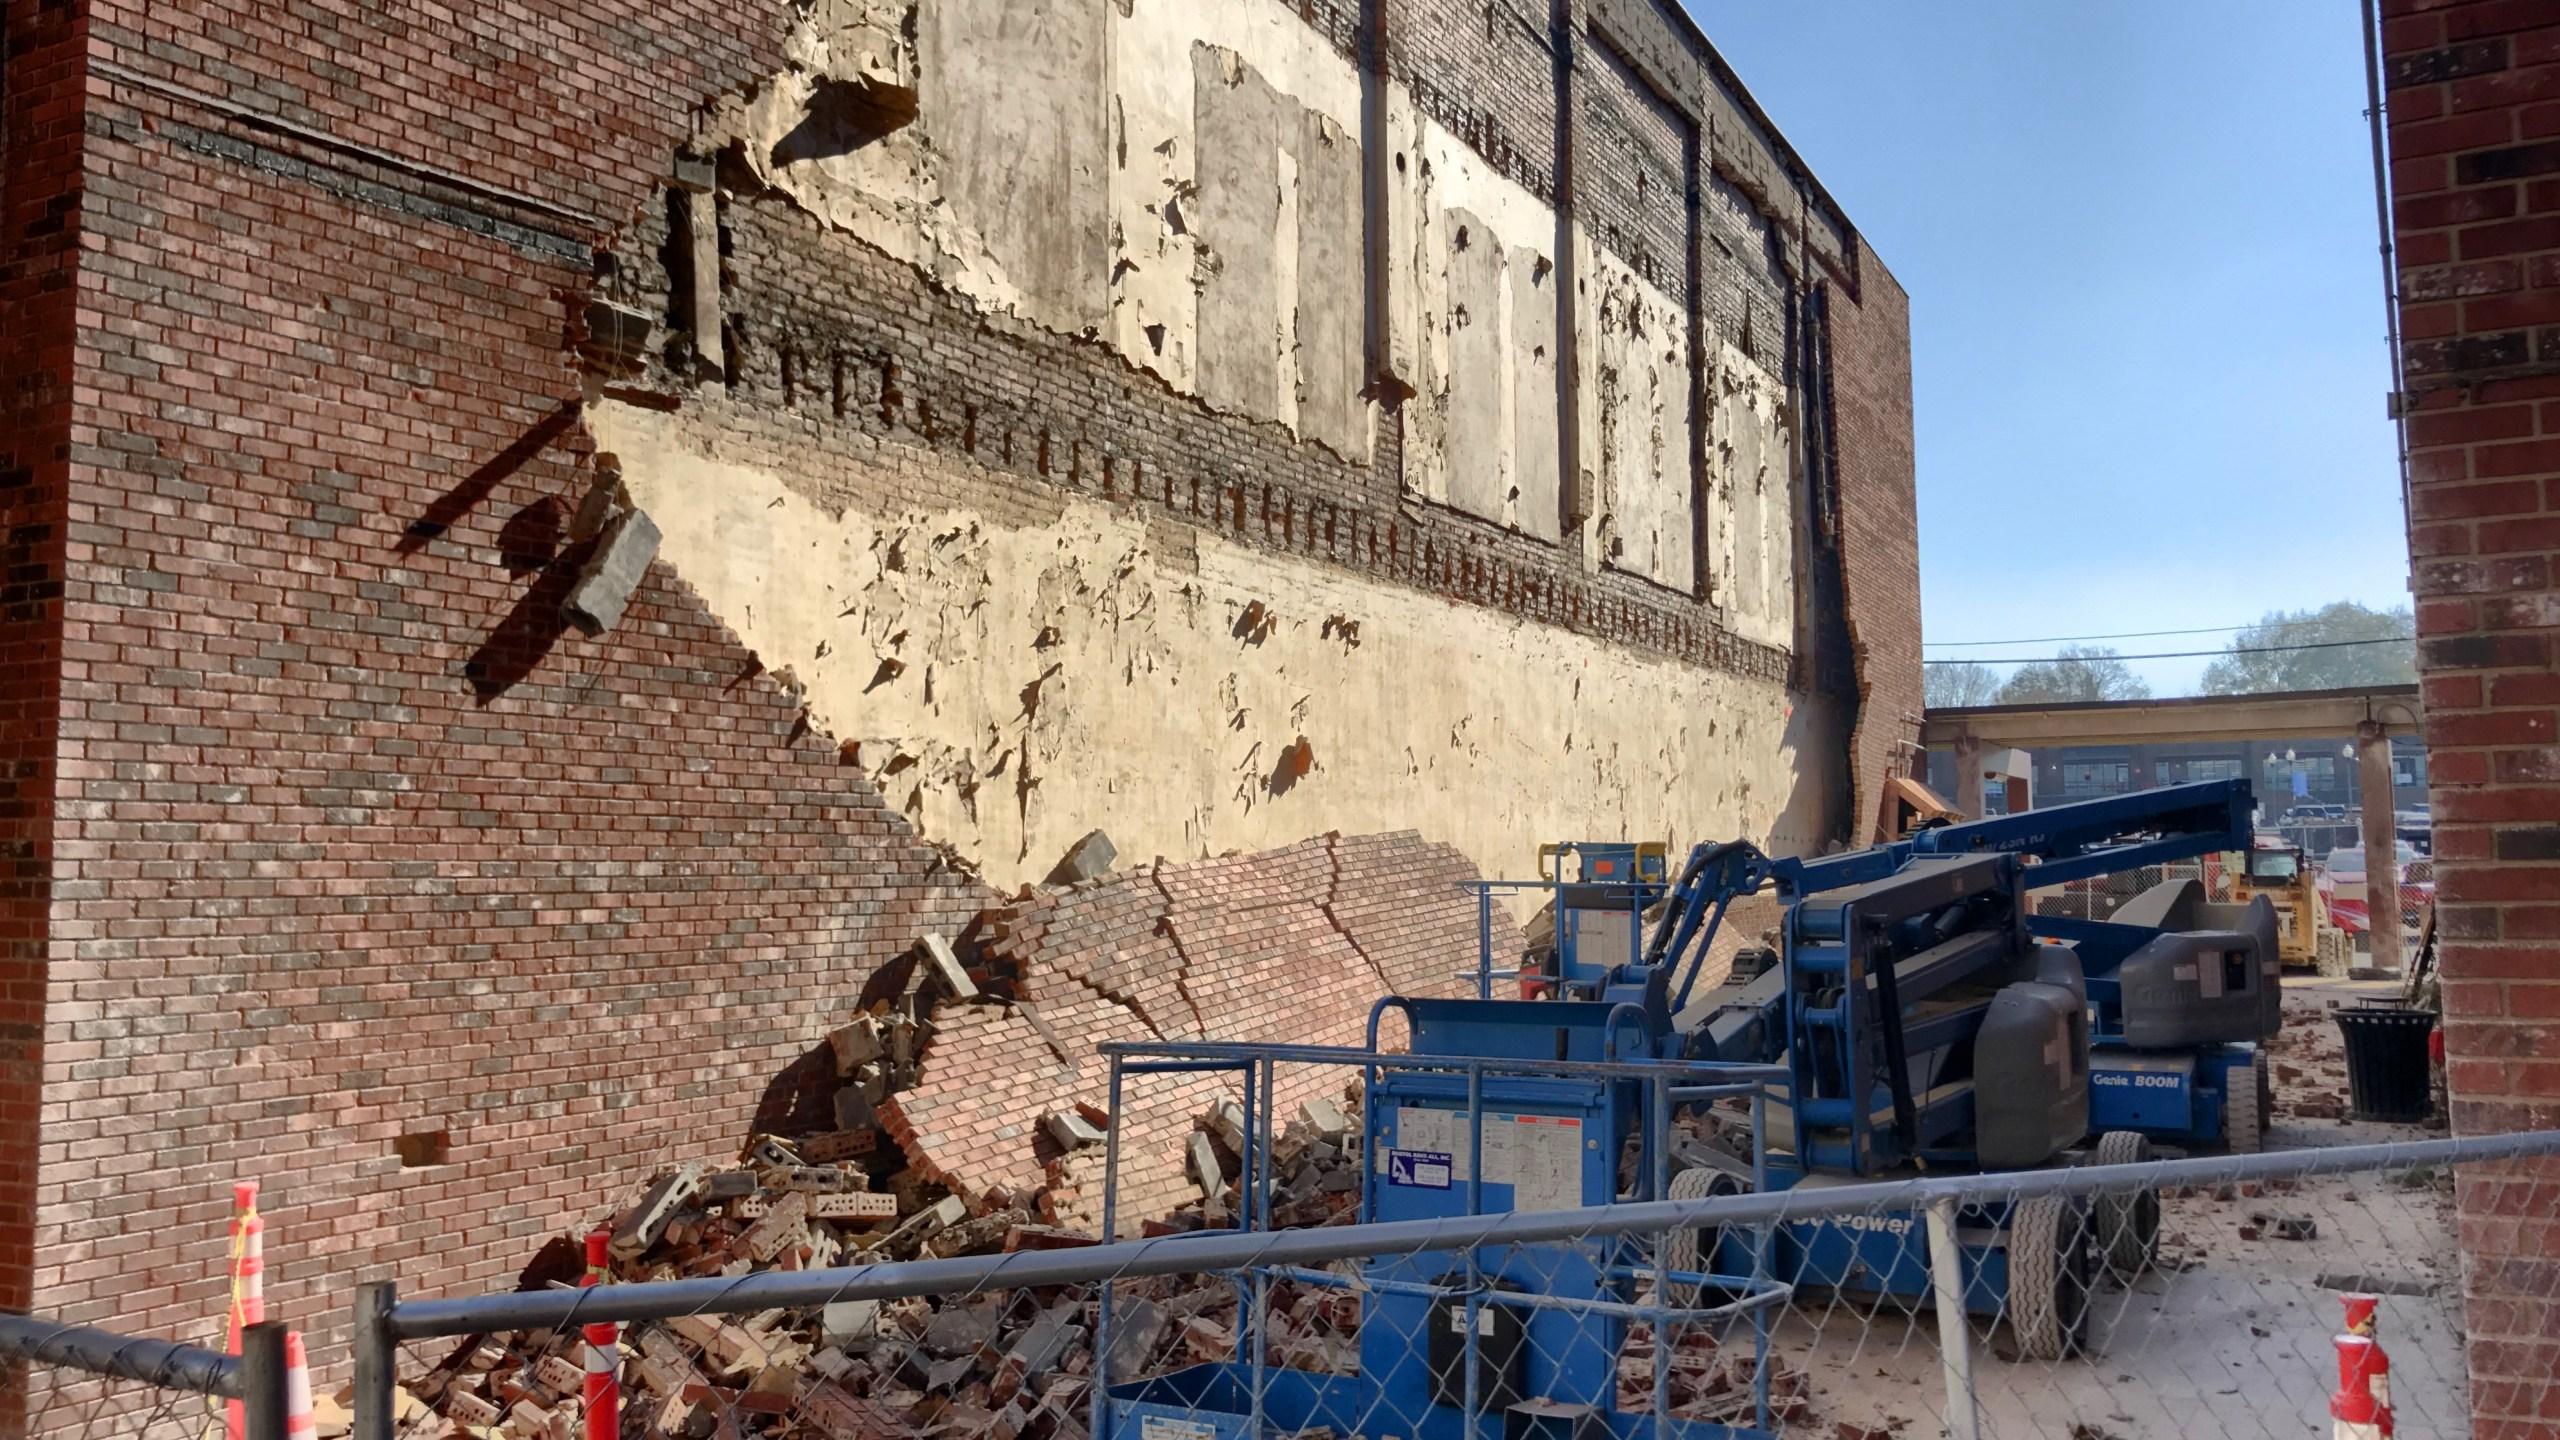 Johnson City Brick Facade Collapse IMG-9105_1542819279751.JPG